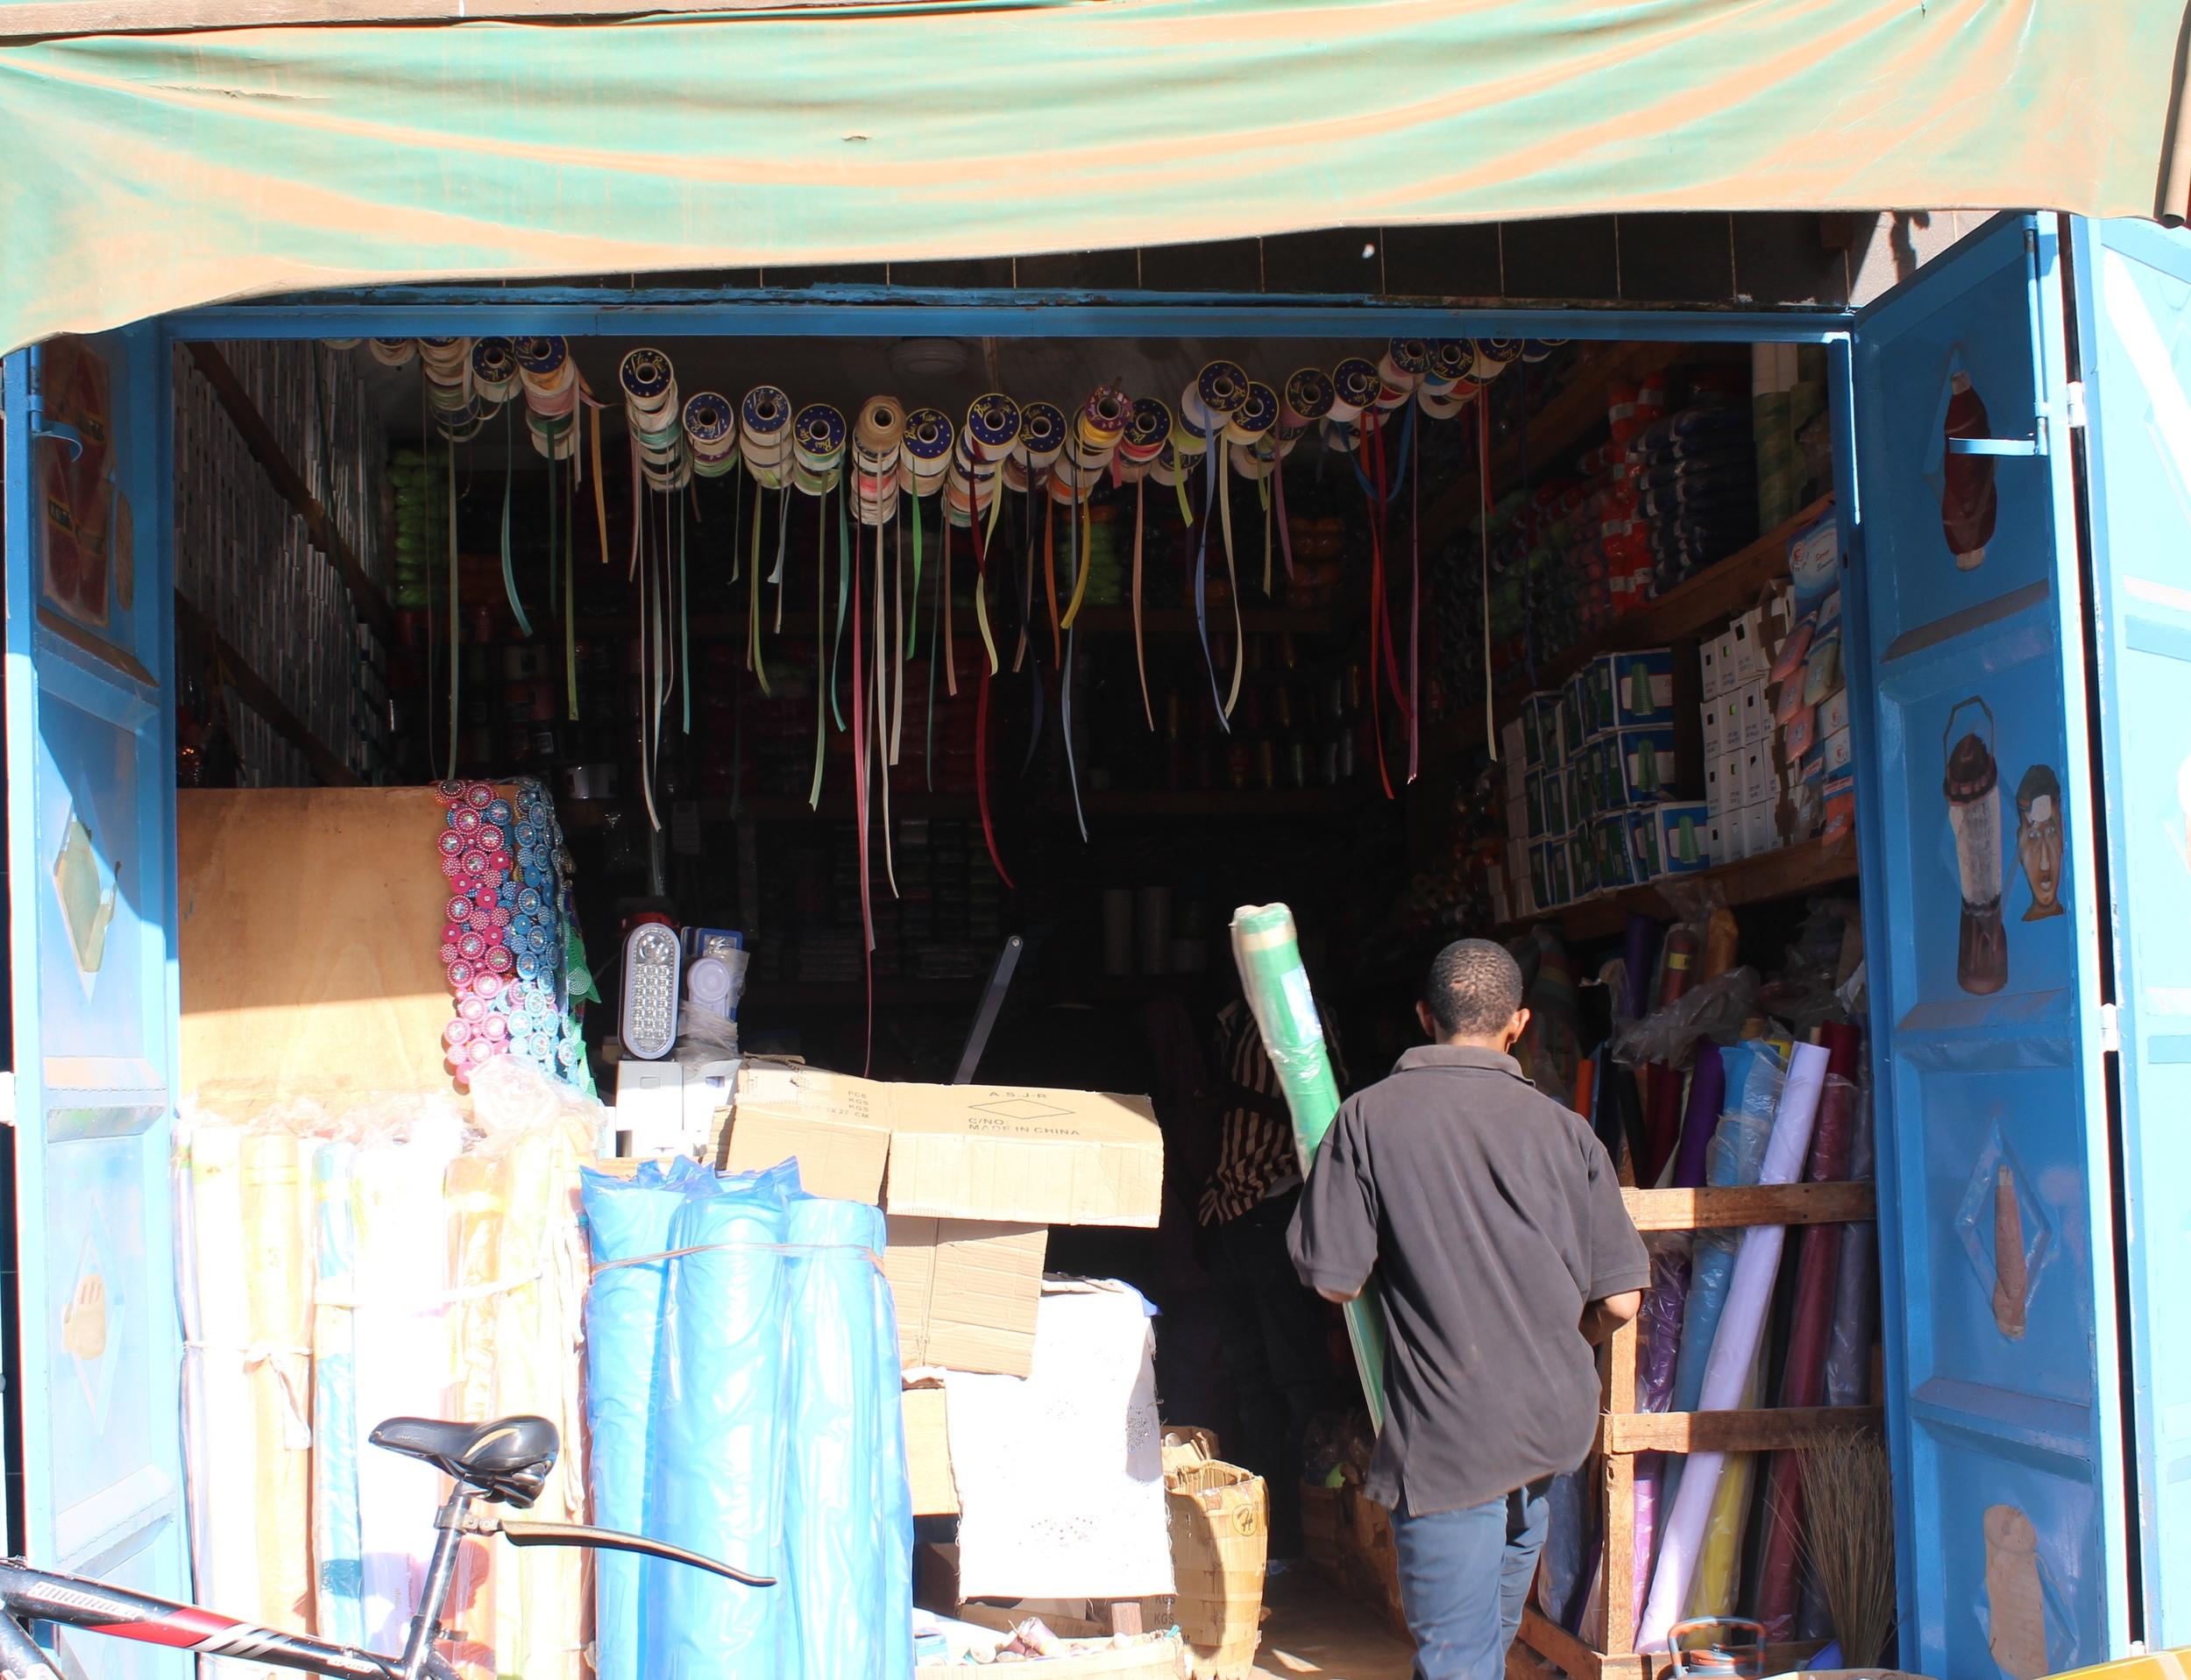 Haberdashery and furnishings shop. Ribbons!